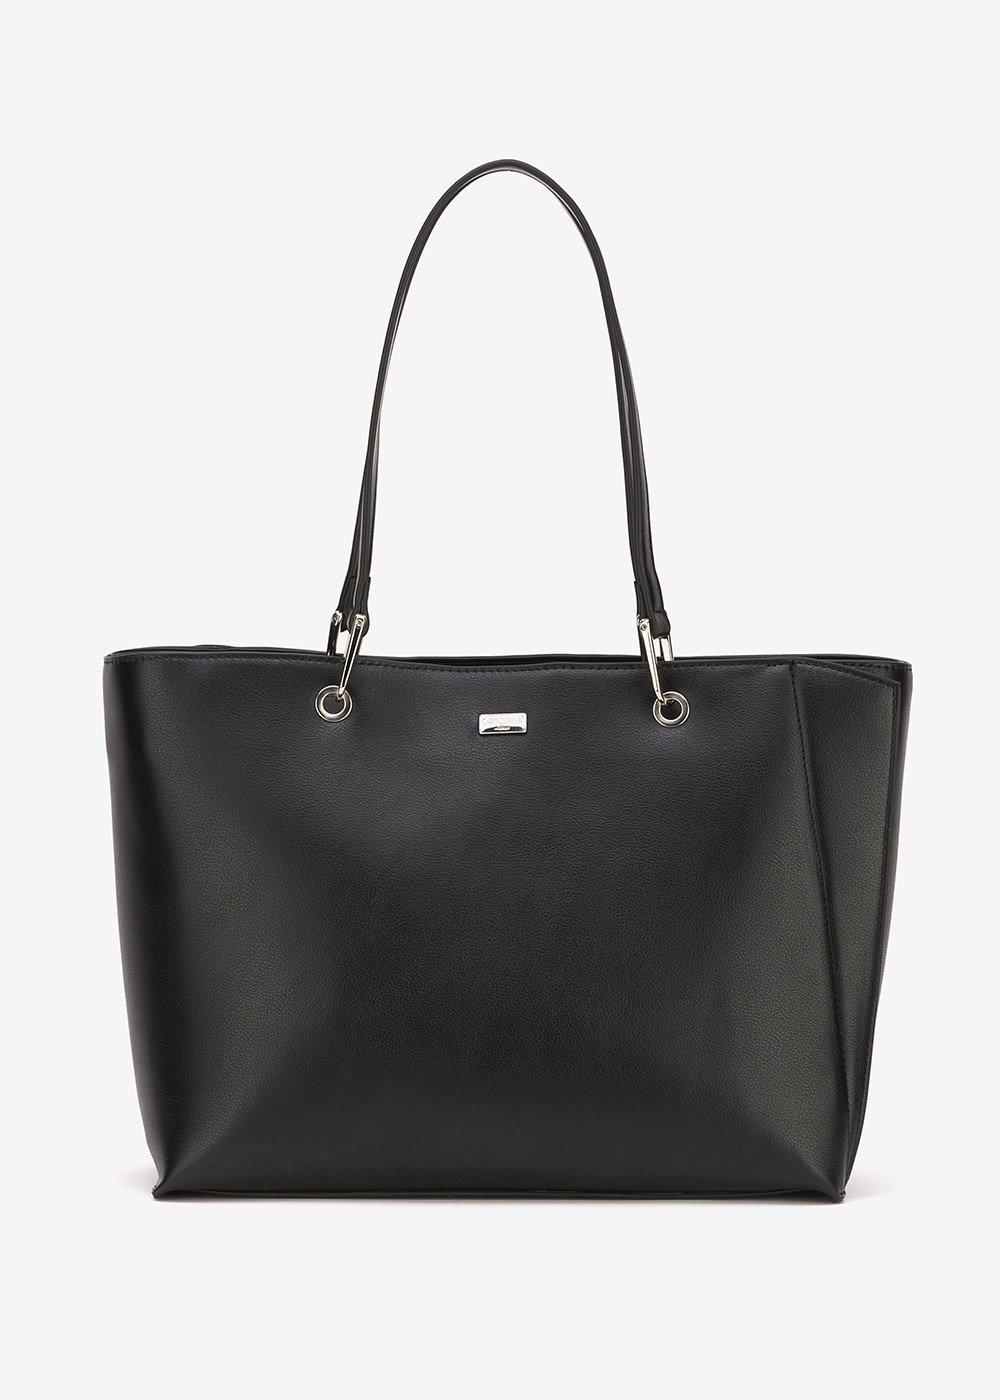 Blunt rigid shopping bag - Black - Woman